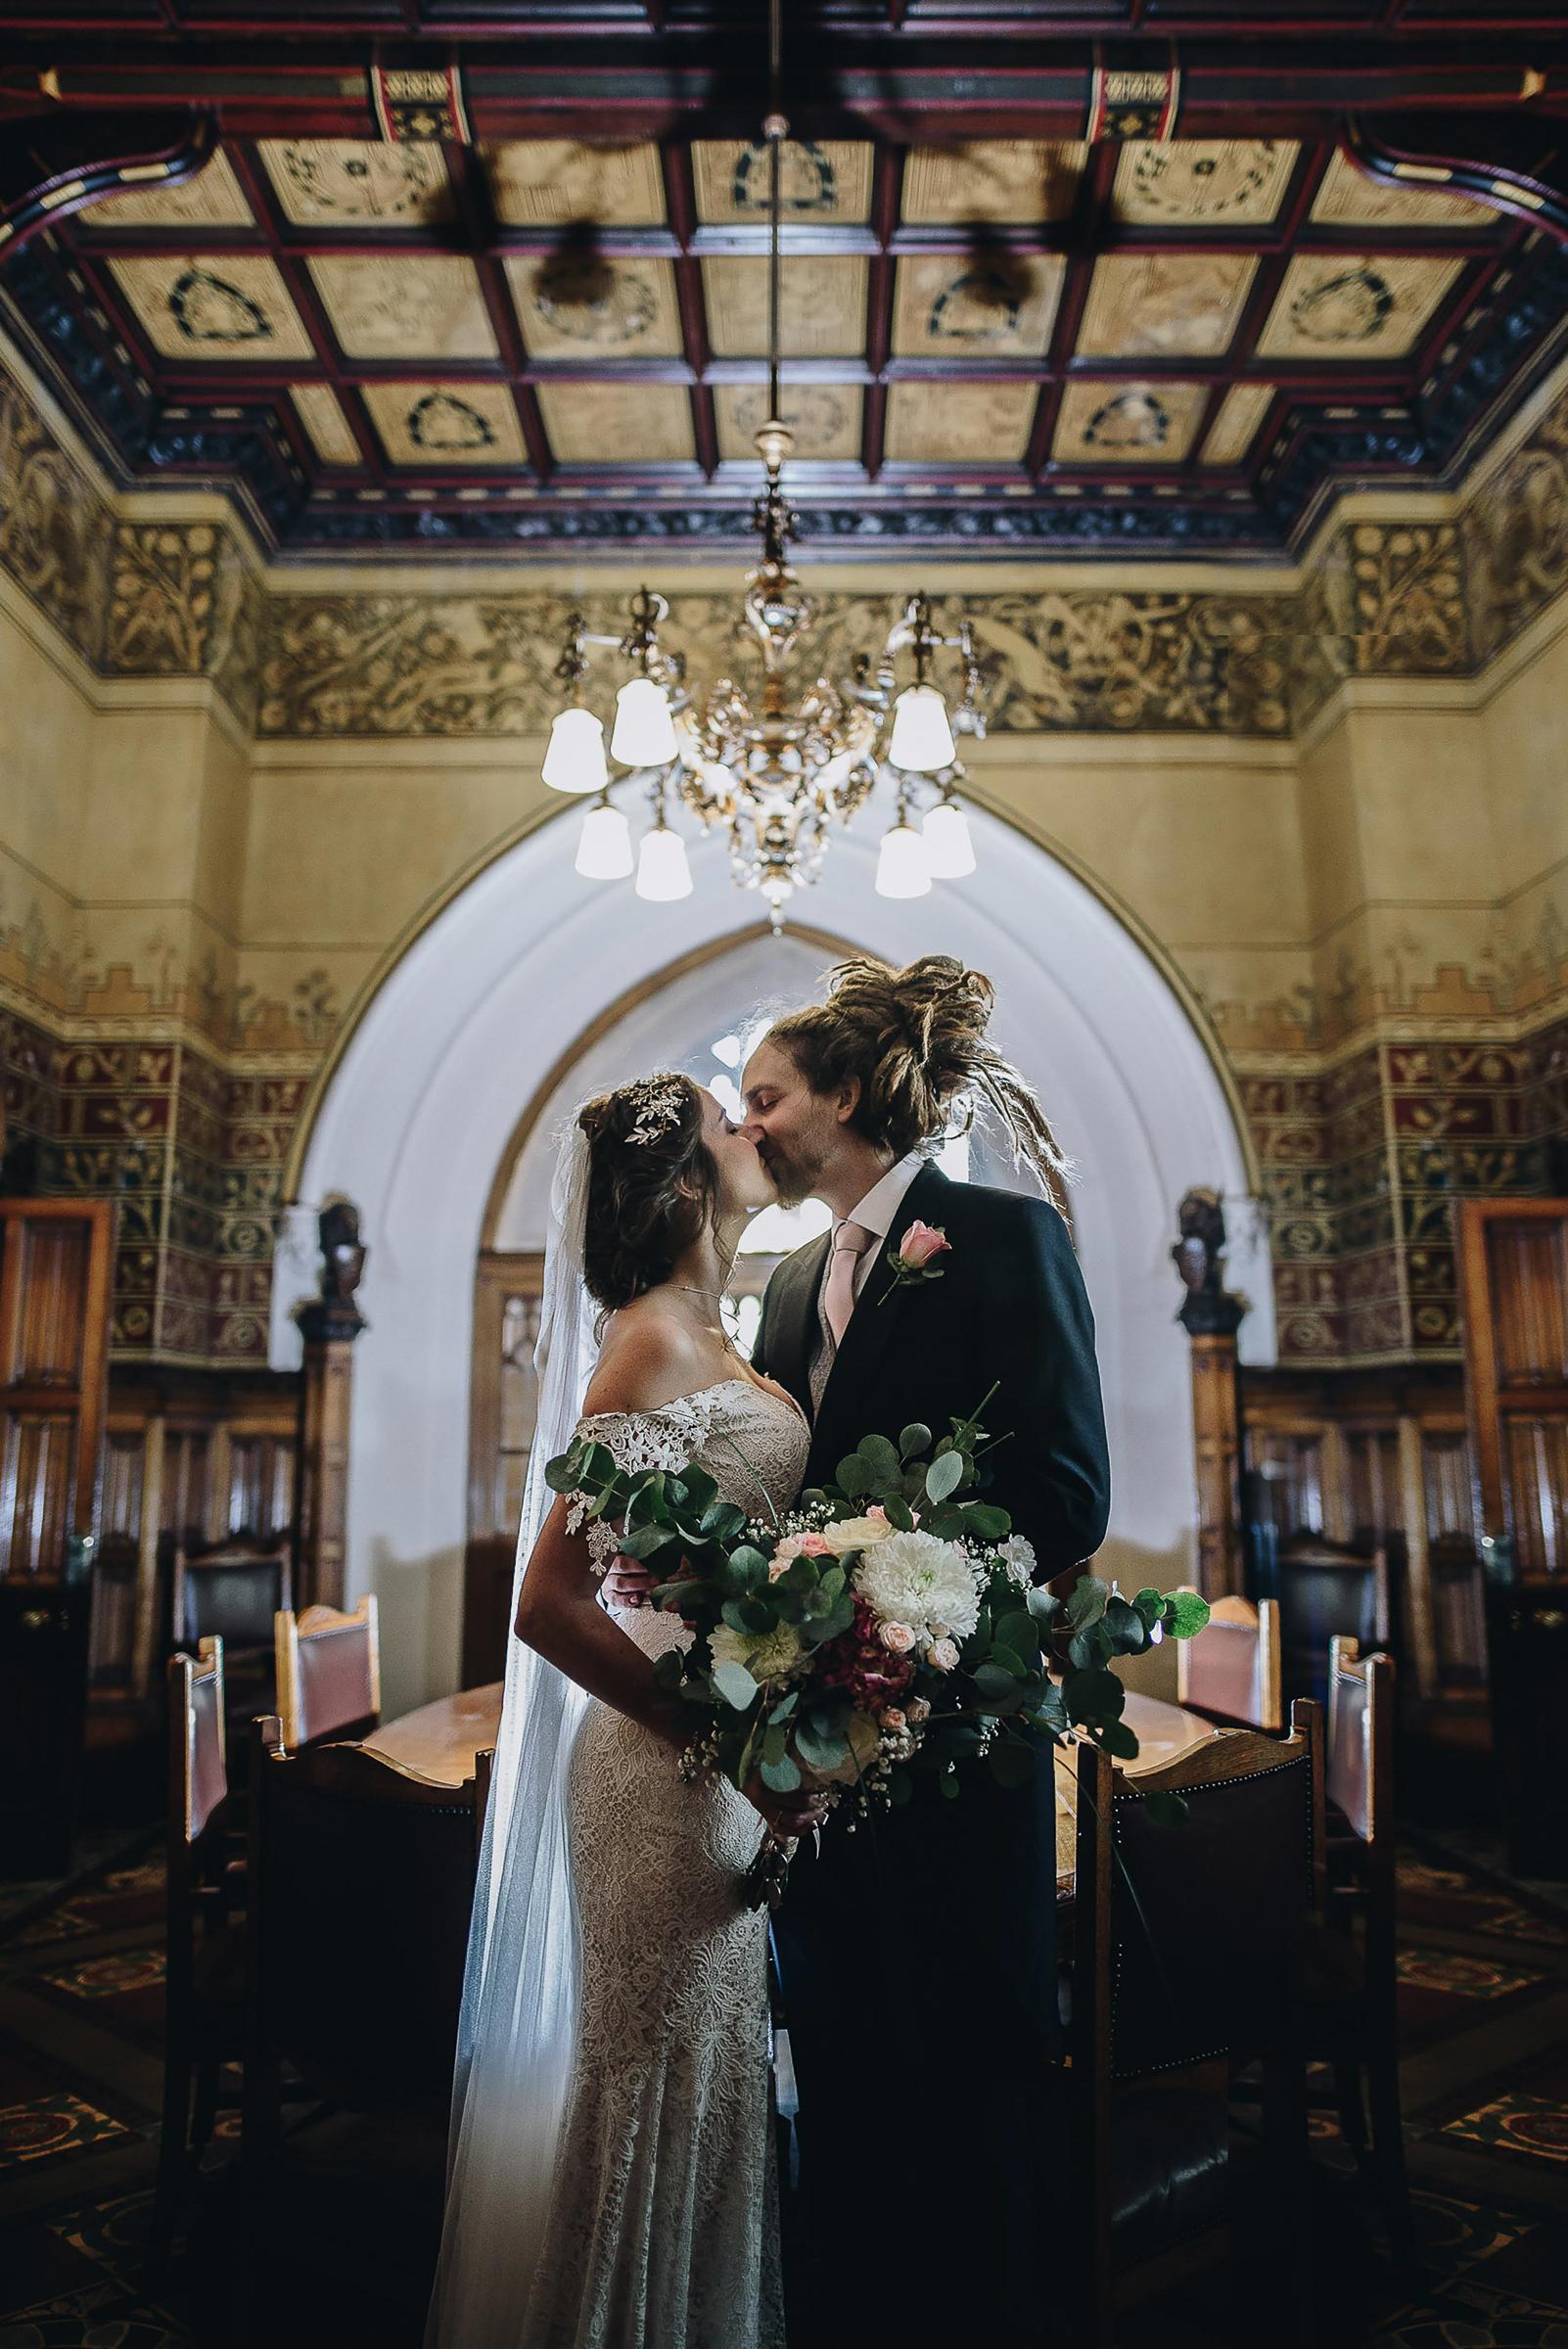 Rochdale-town-hall-vegan-harry-potter-wedding-photography-30.jpg